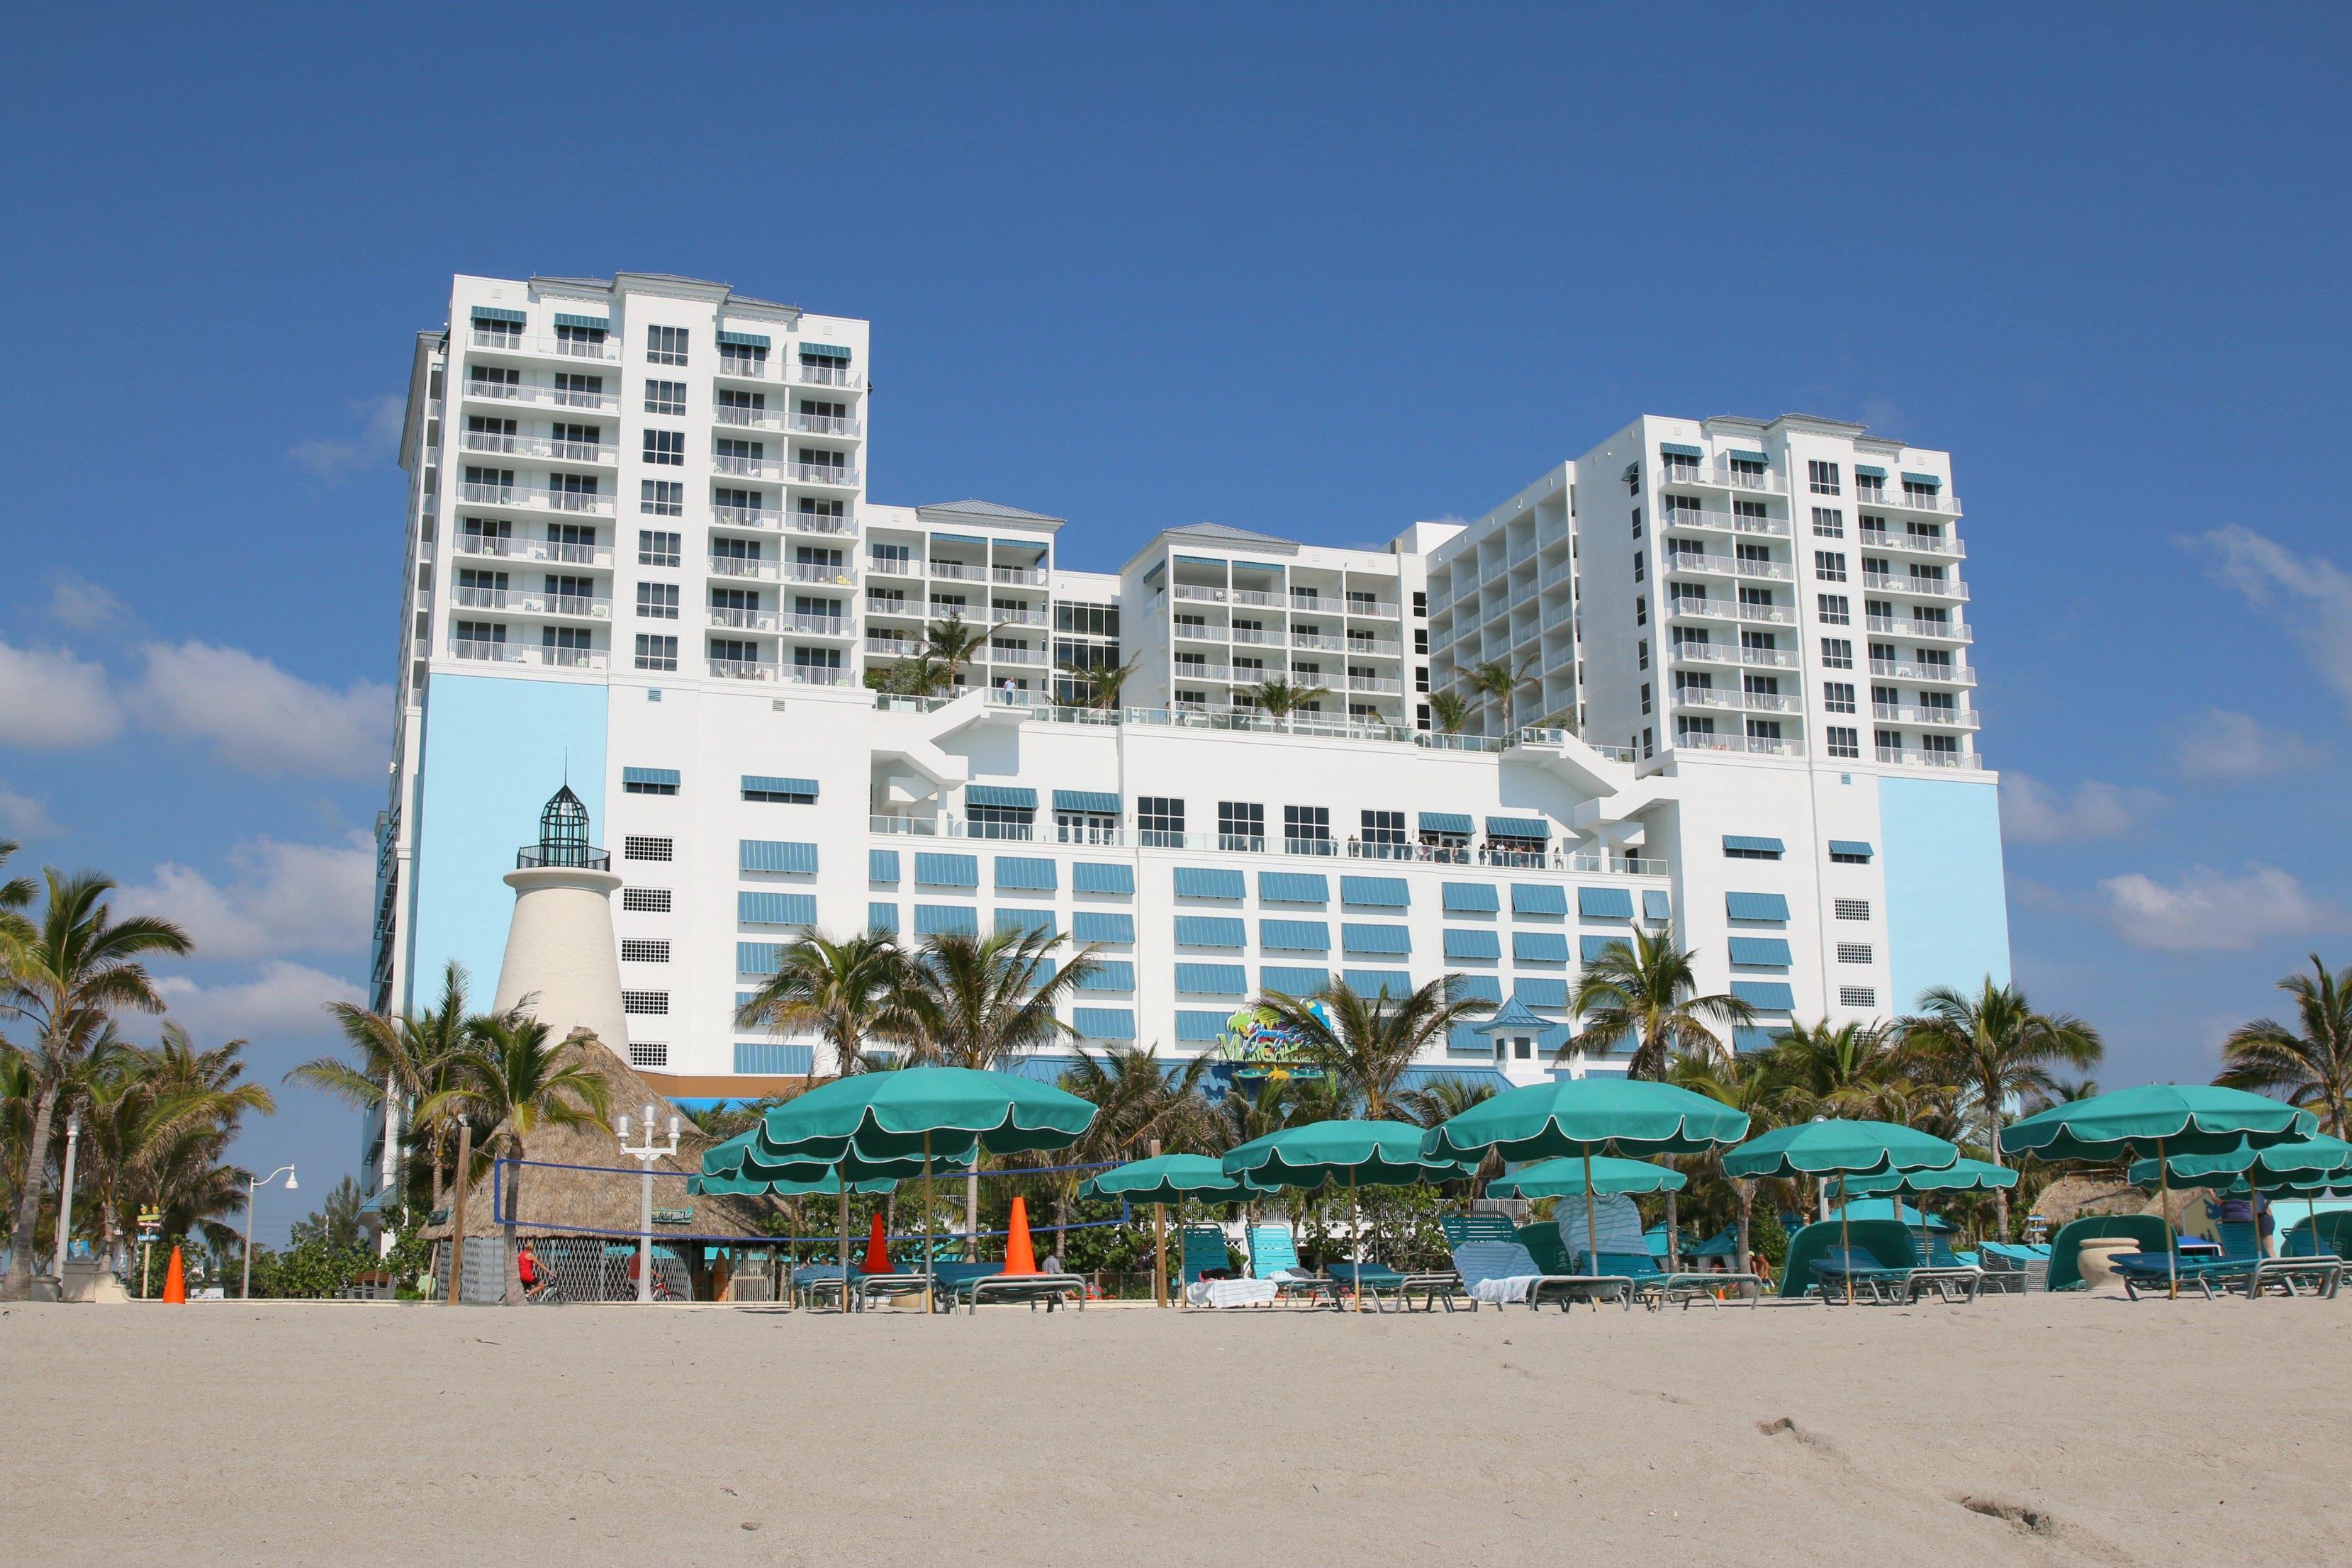 Margaritaville outdoor decor exclusive home design for Design hotel hollywood florida